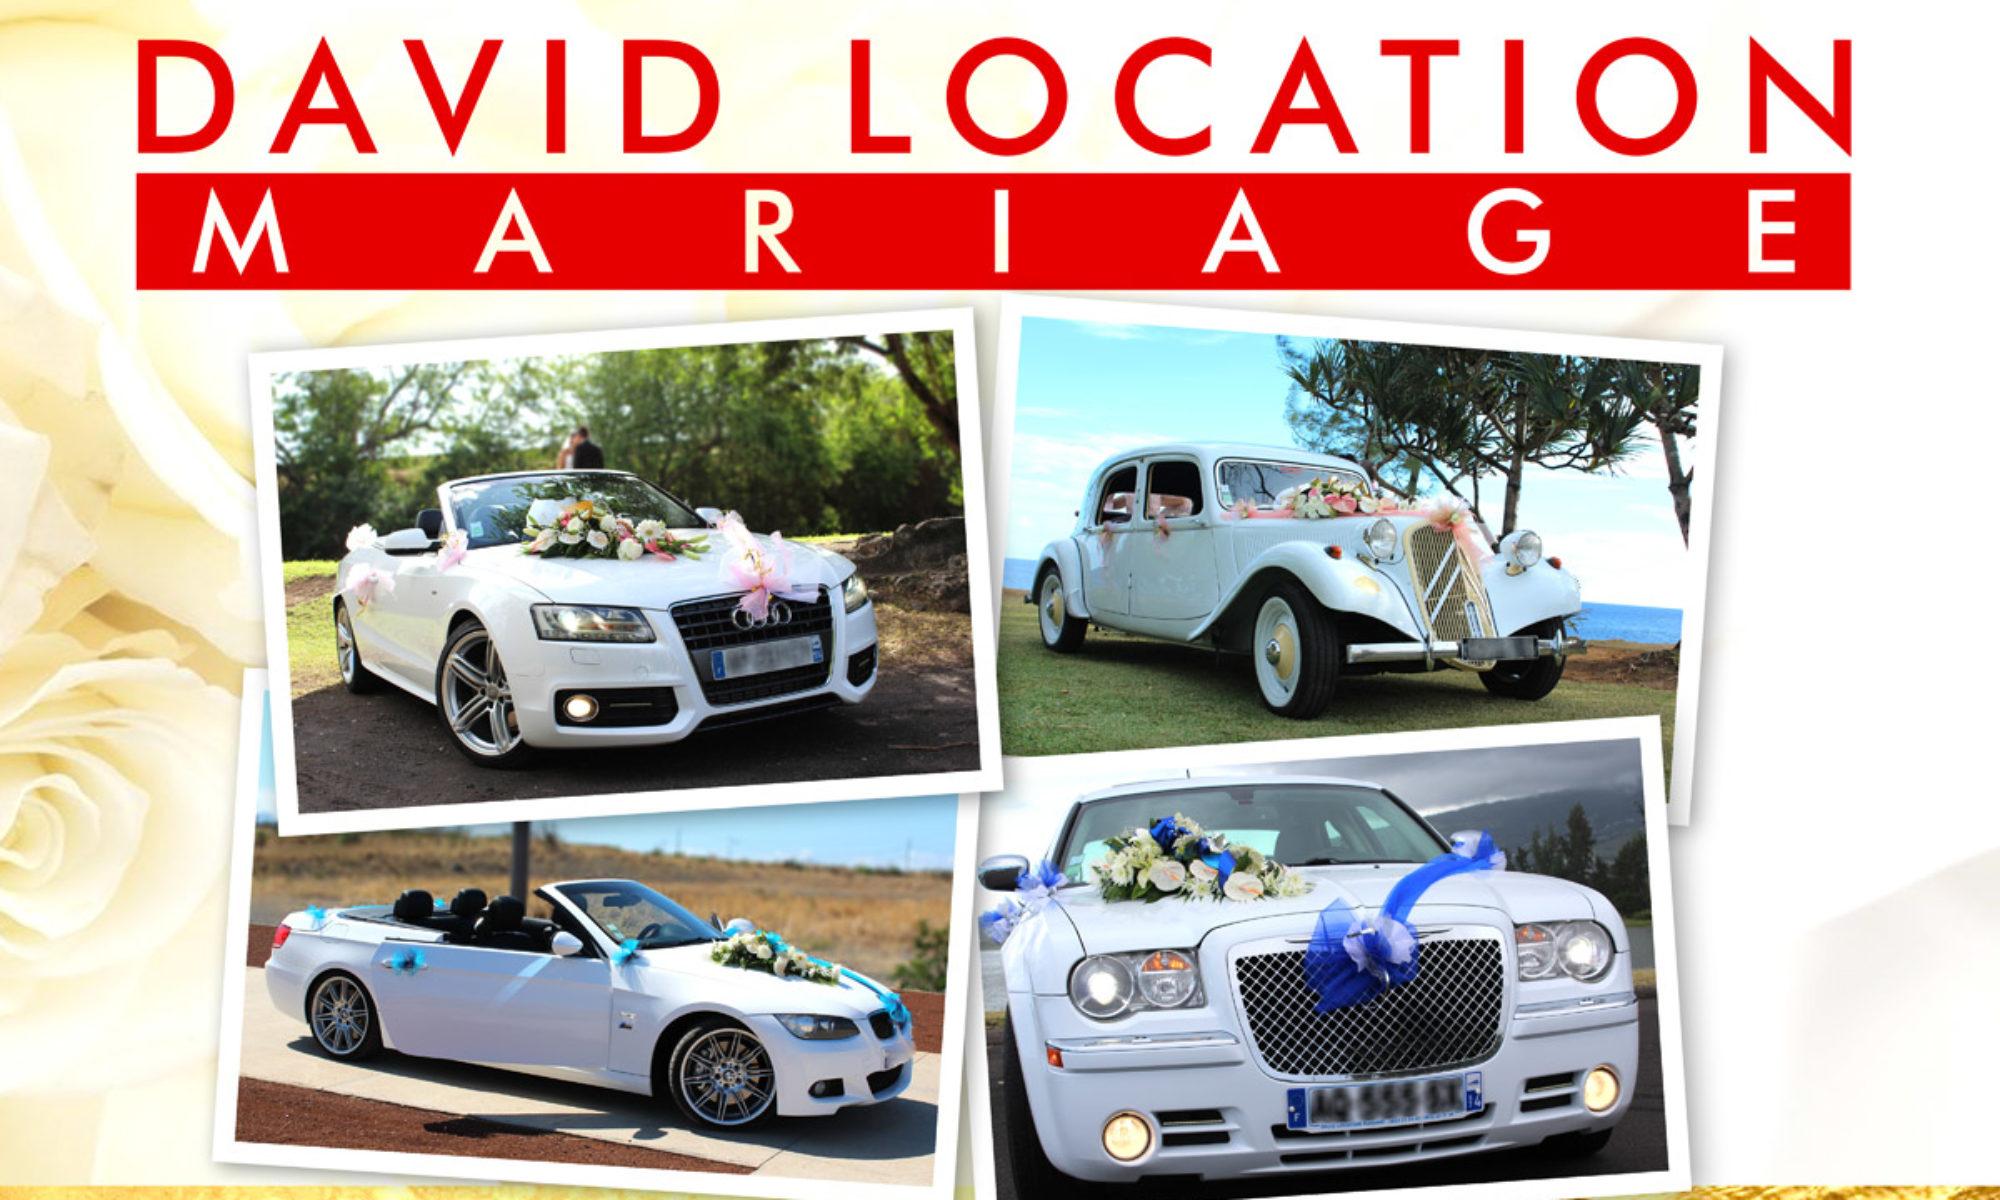 David Location